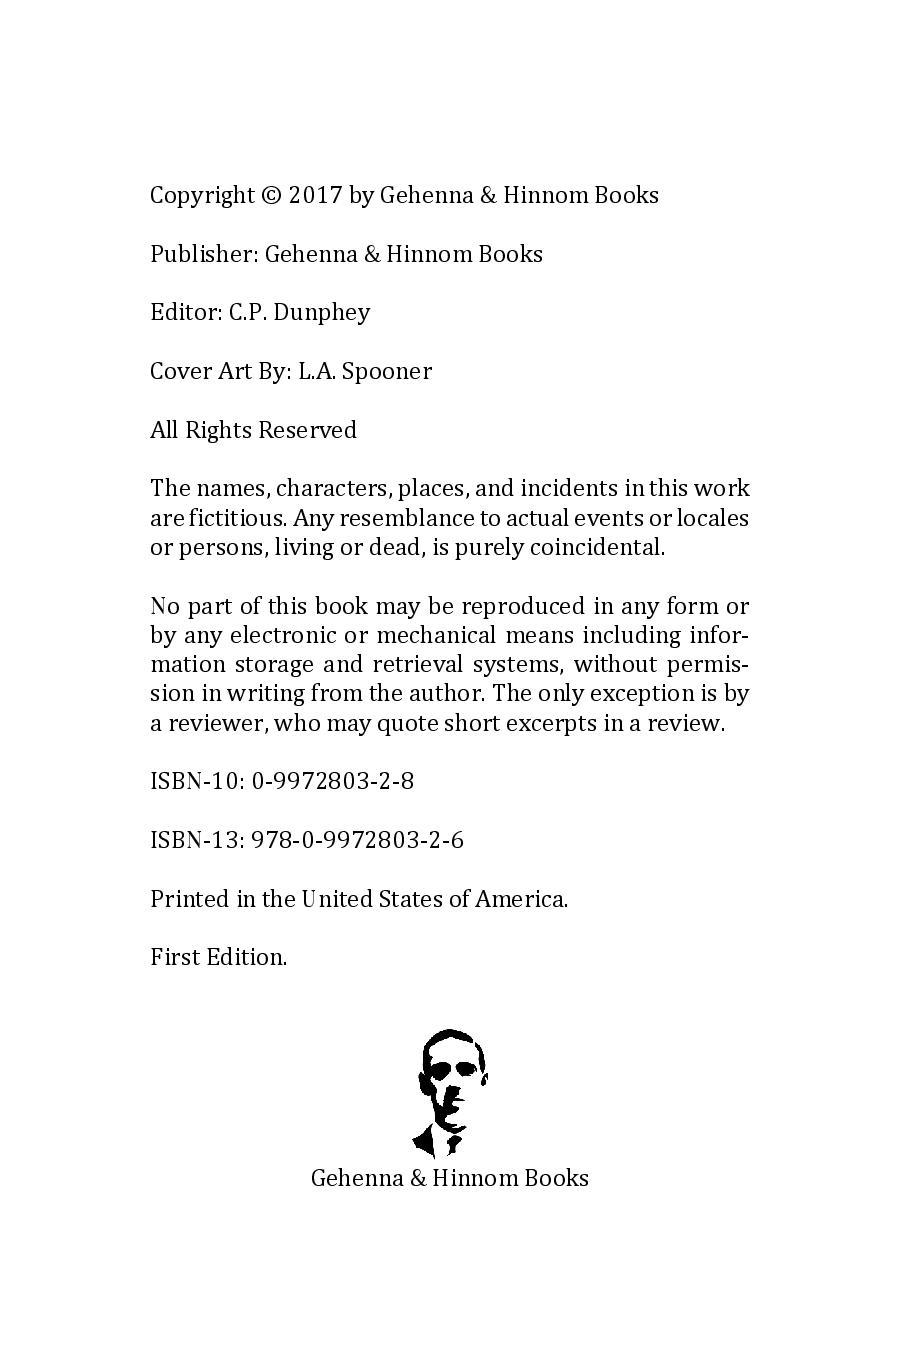 Hinnom Magazine 001 Manuscript 10-page-002